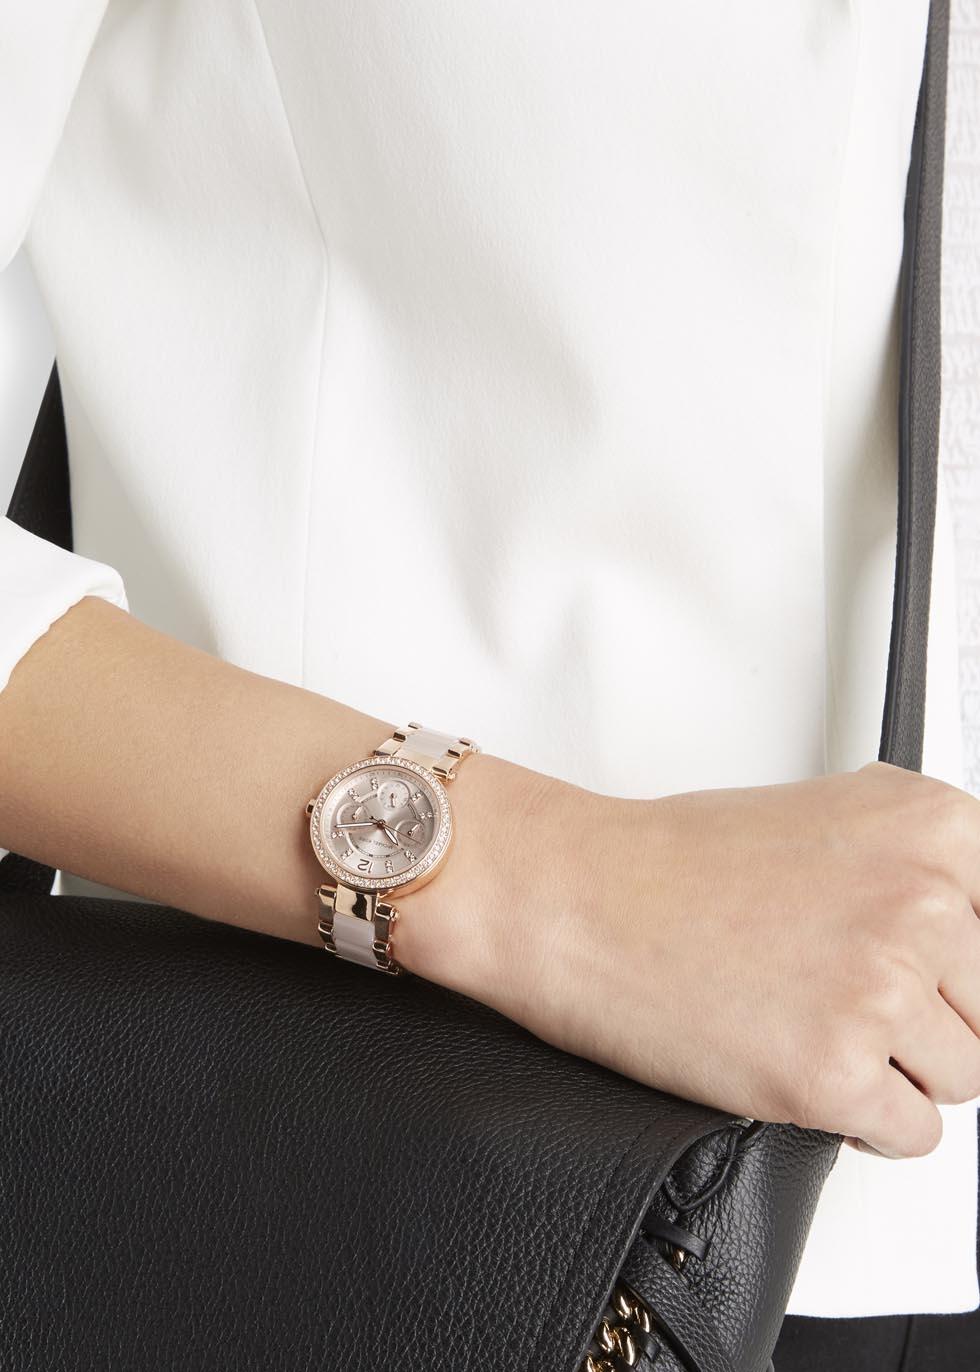 fbb2f9d8d98d Michael Kors Mini Parker Rose Gold Tone Chronograph Watch In Pink Lyst. Michael  Kors Mk5896 Women S Parker Rose Gold Dial ...